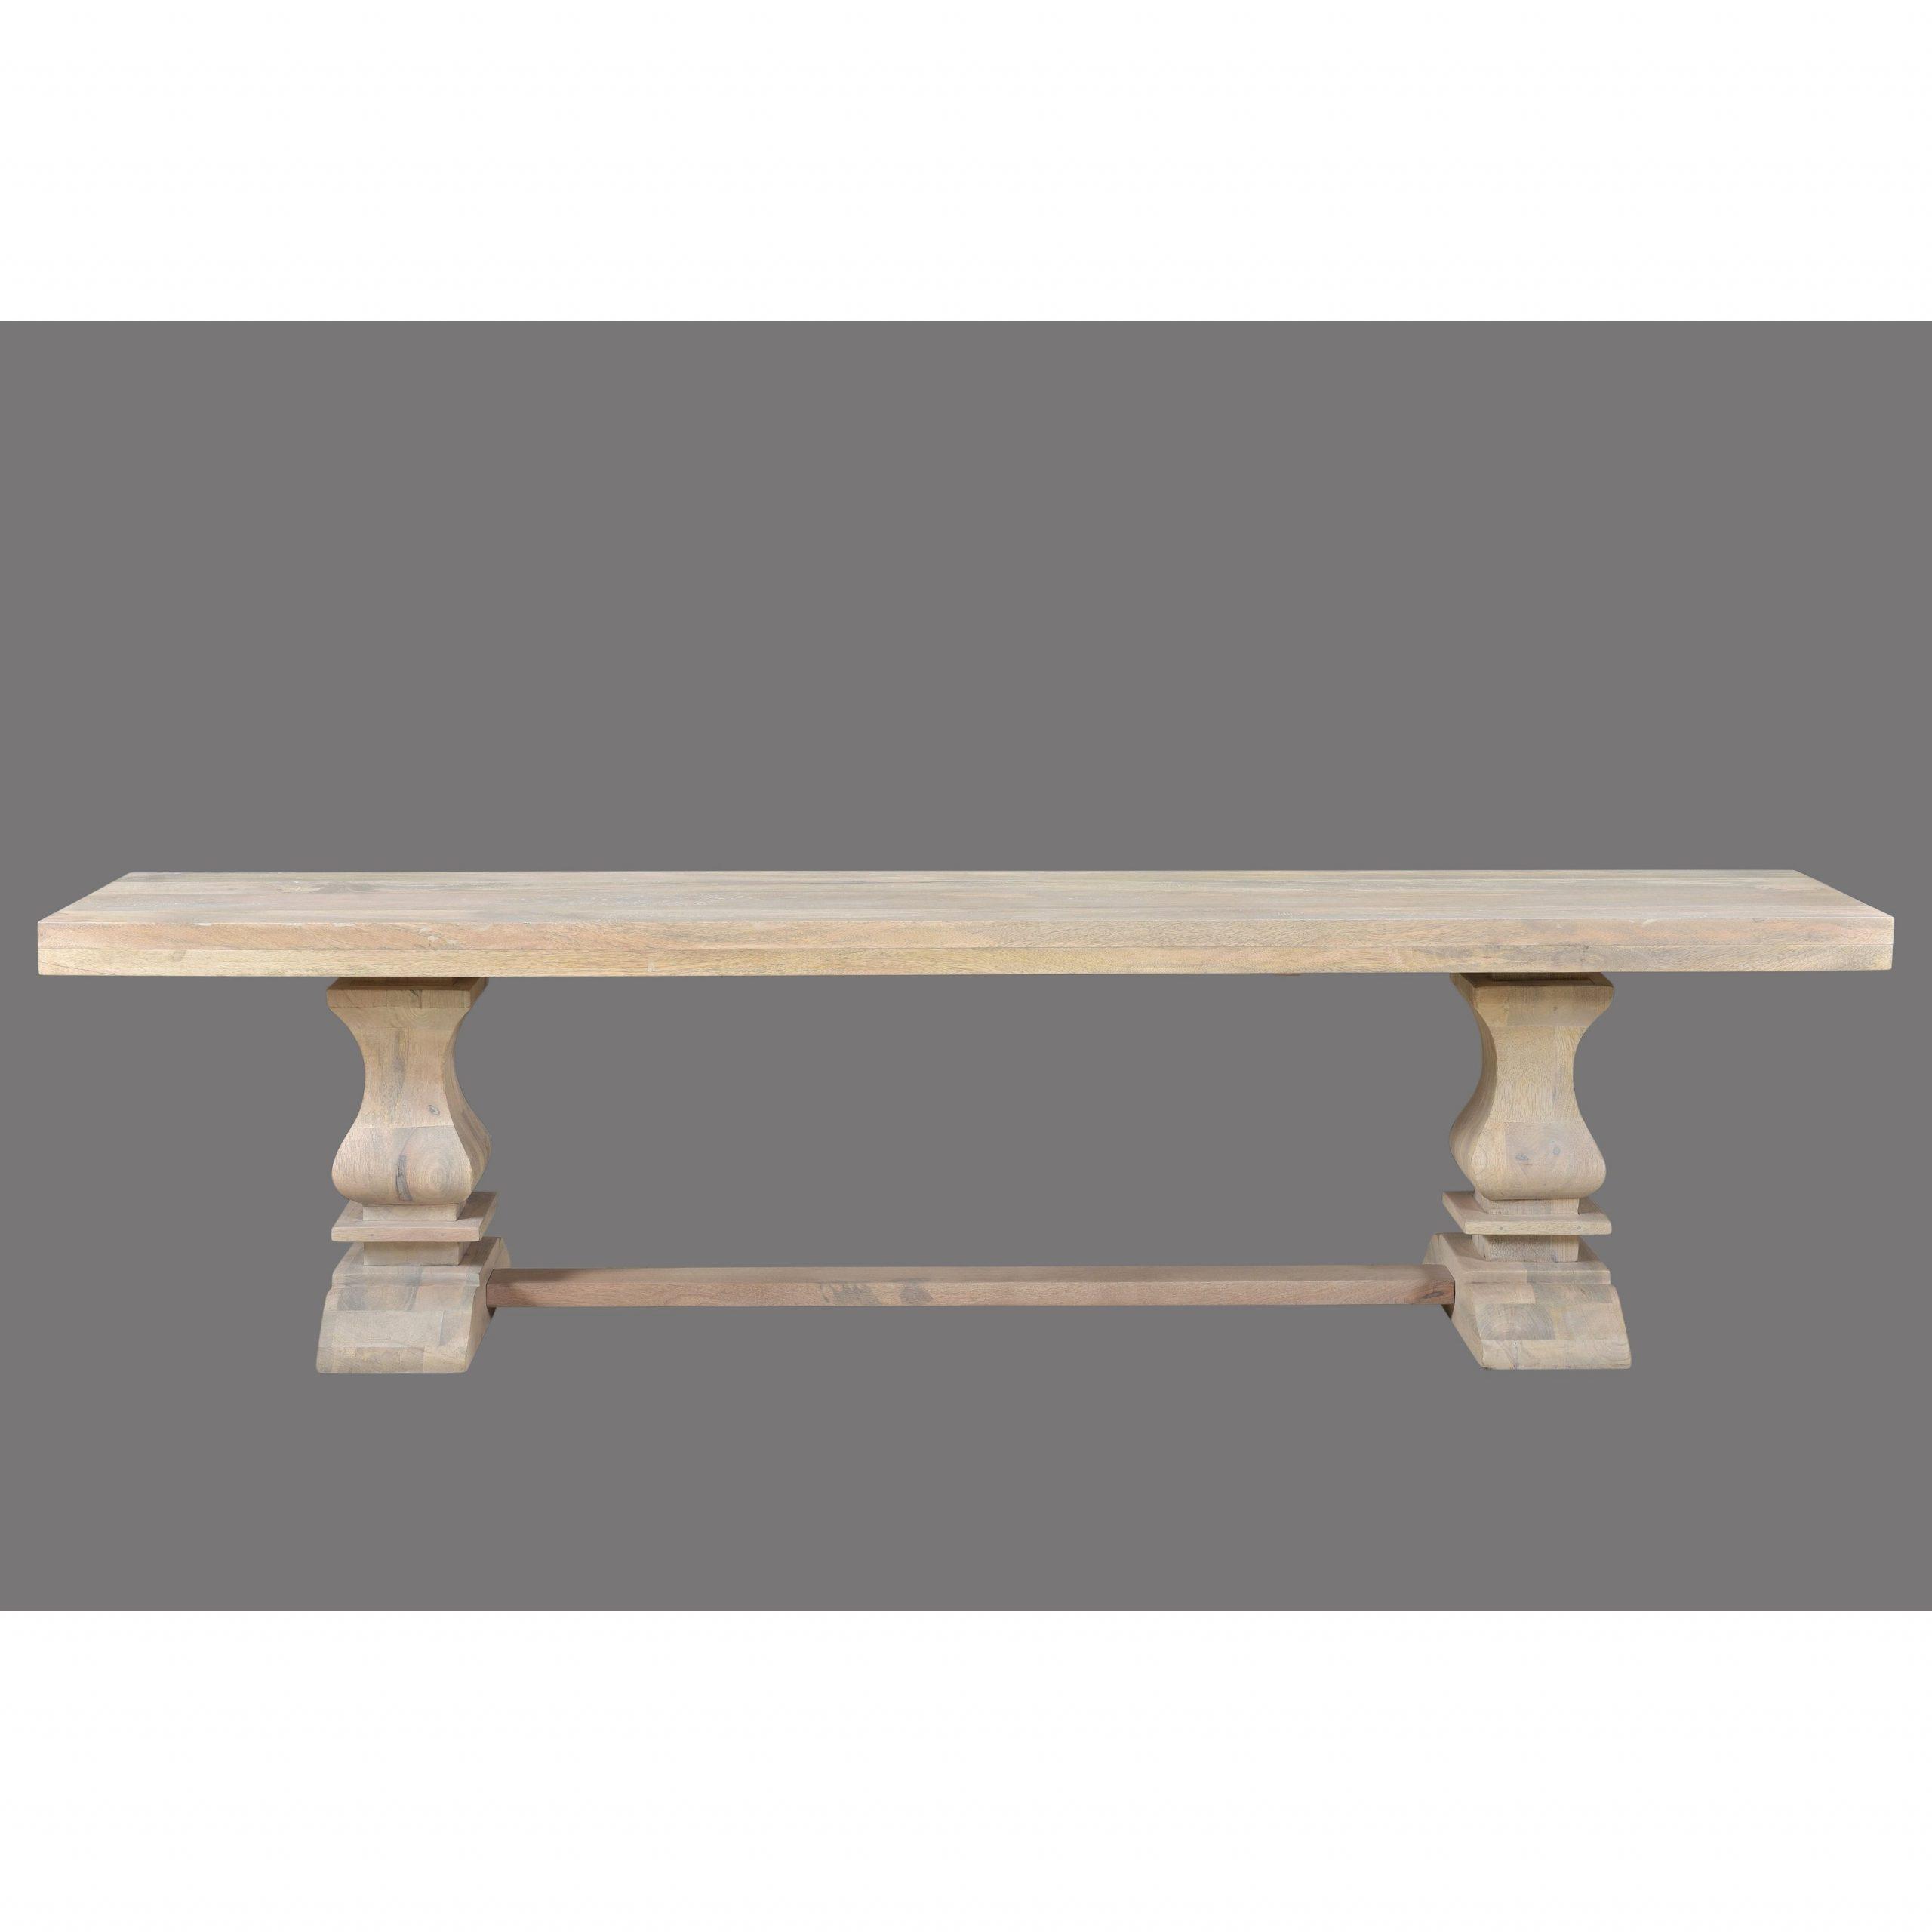 Trendy Maliyah Wooden Garden Benches Regarding Maliyah Pedestal Wood Bench – 18'' H X 72'' W X 15'' D (View 11 of 30)